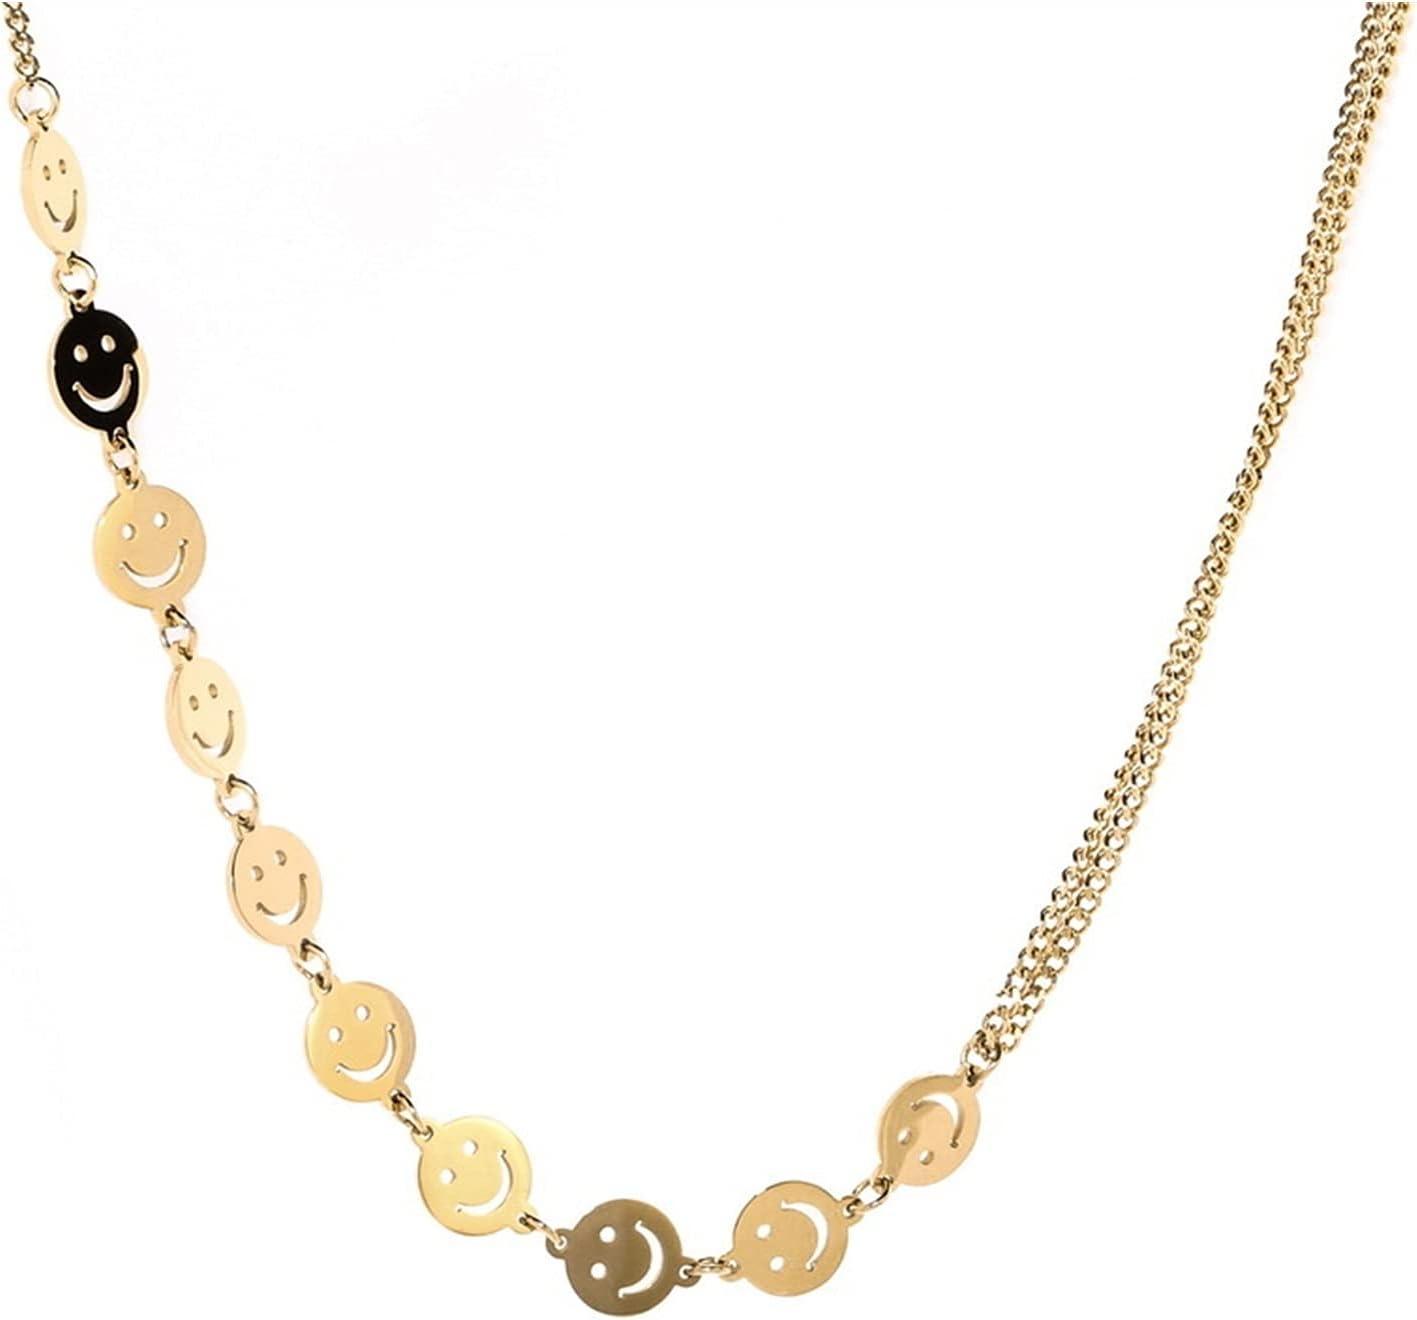 YESYI SHMGO Simple Ins Style Choker Female Colorado Springs Mall Necklace Face Smiley Sacramento Mall